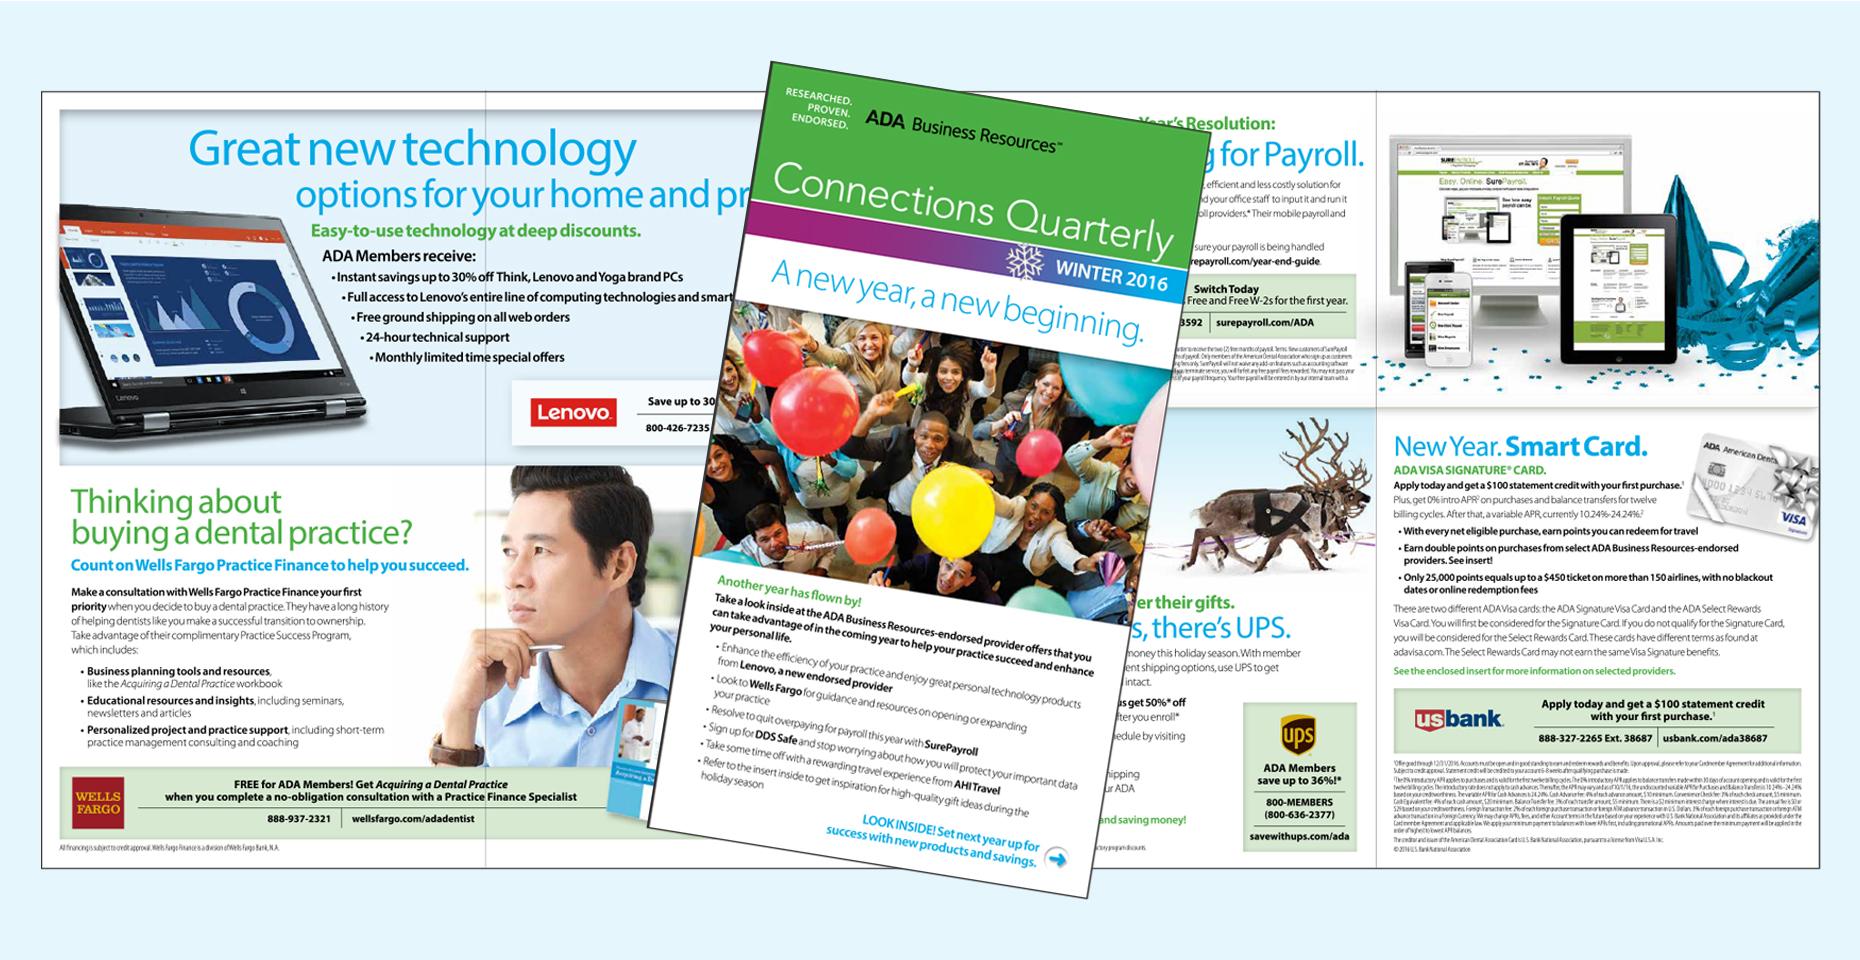 NEWSLETTER: ADA Business Resources